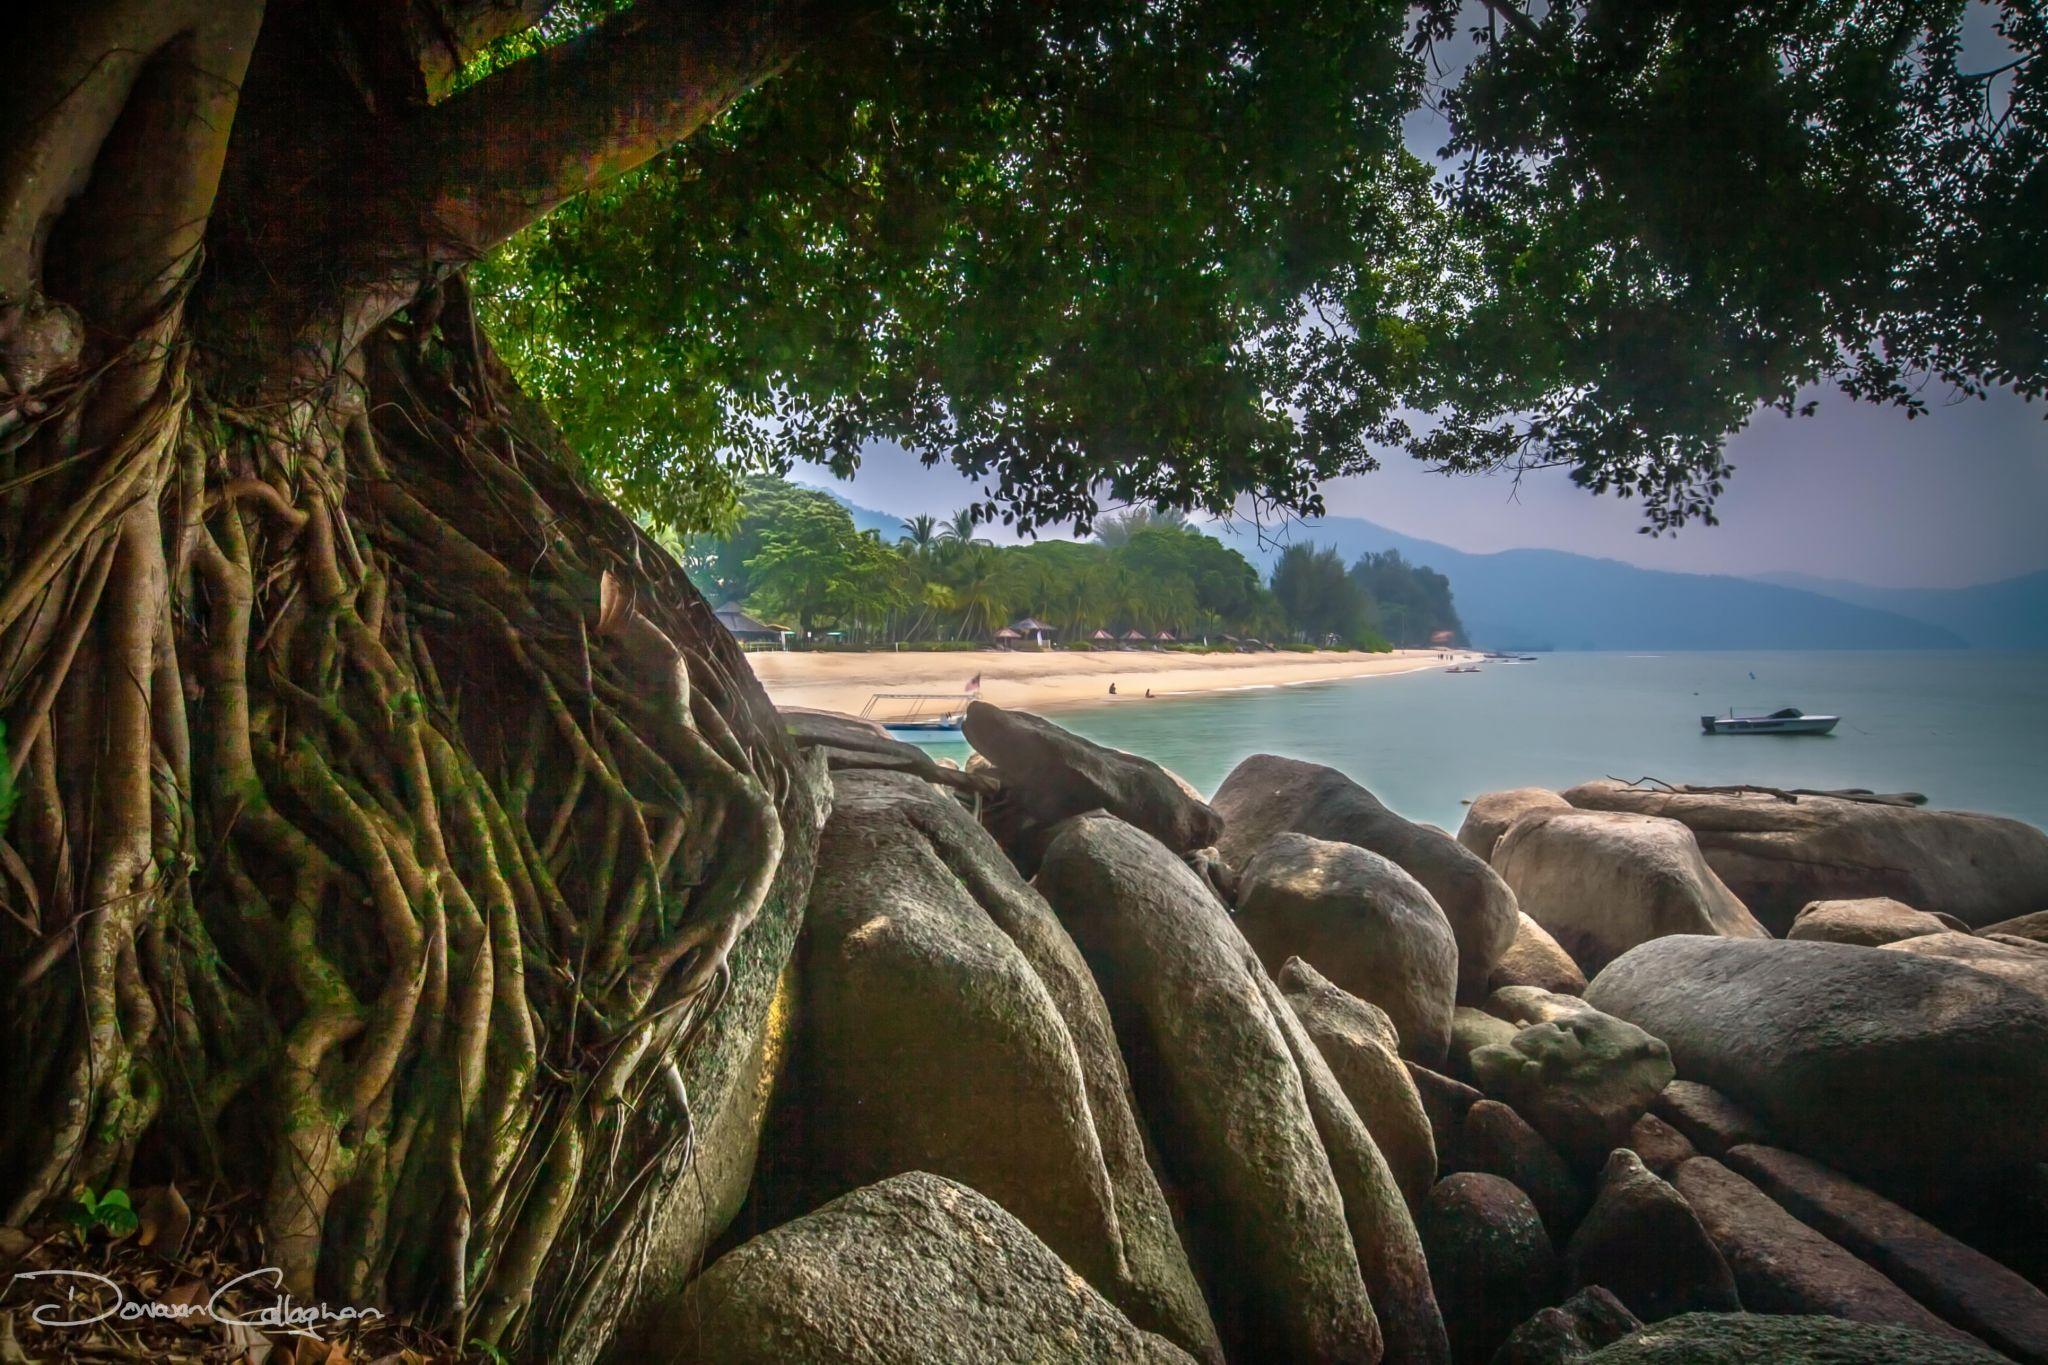 Beach through the trees, Malaysia